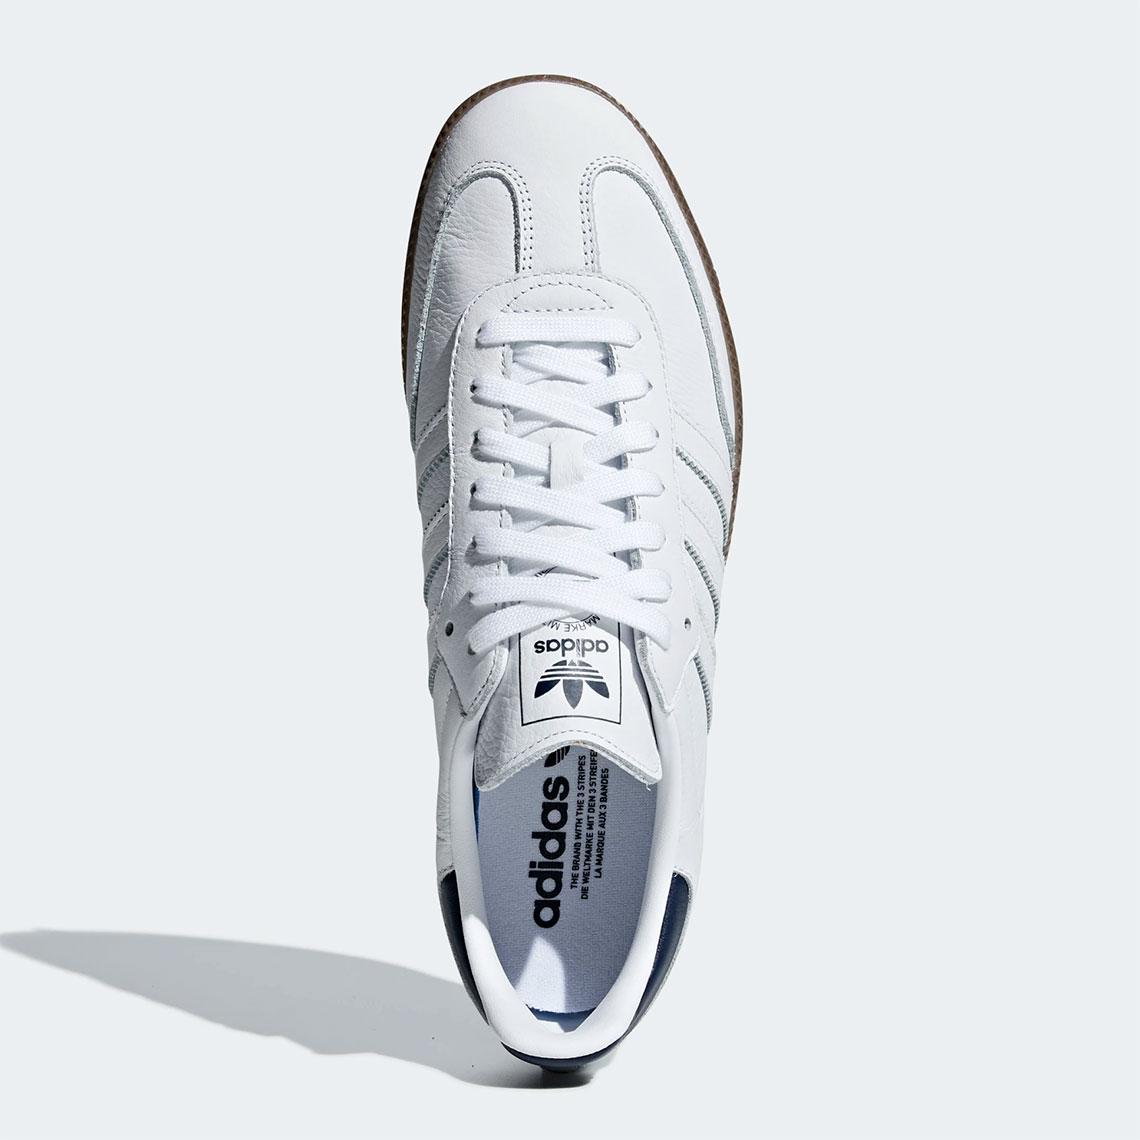 Adidas Samba OG D96782 / D96783 Release Info   SneakerNews.com